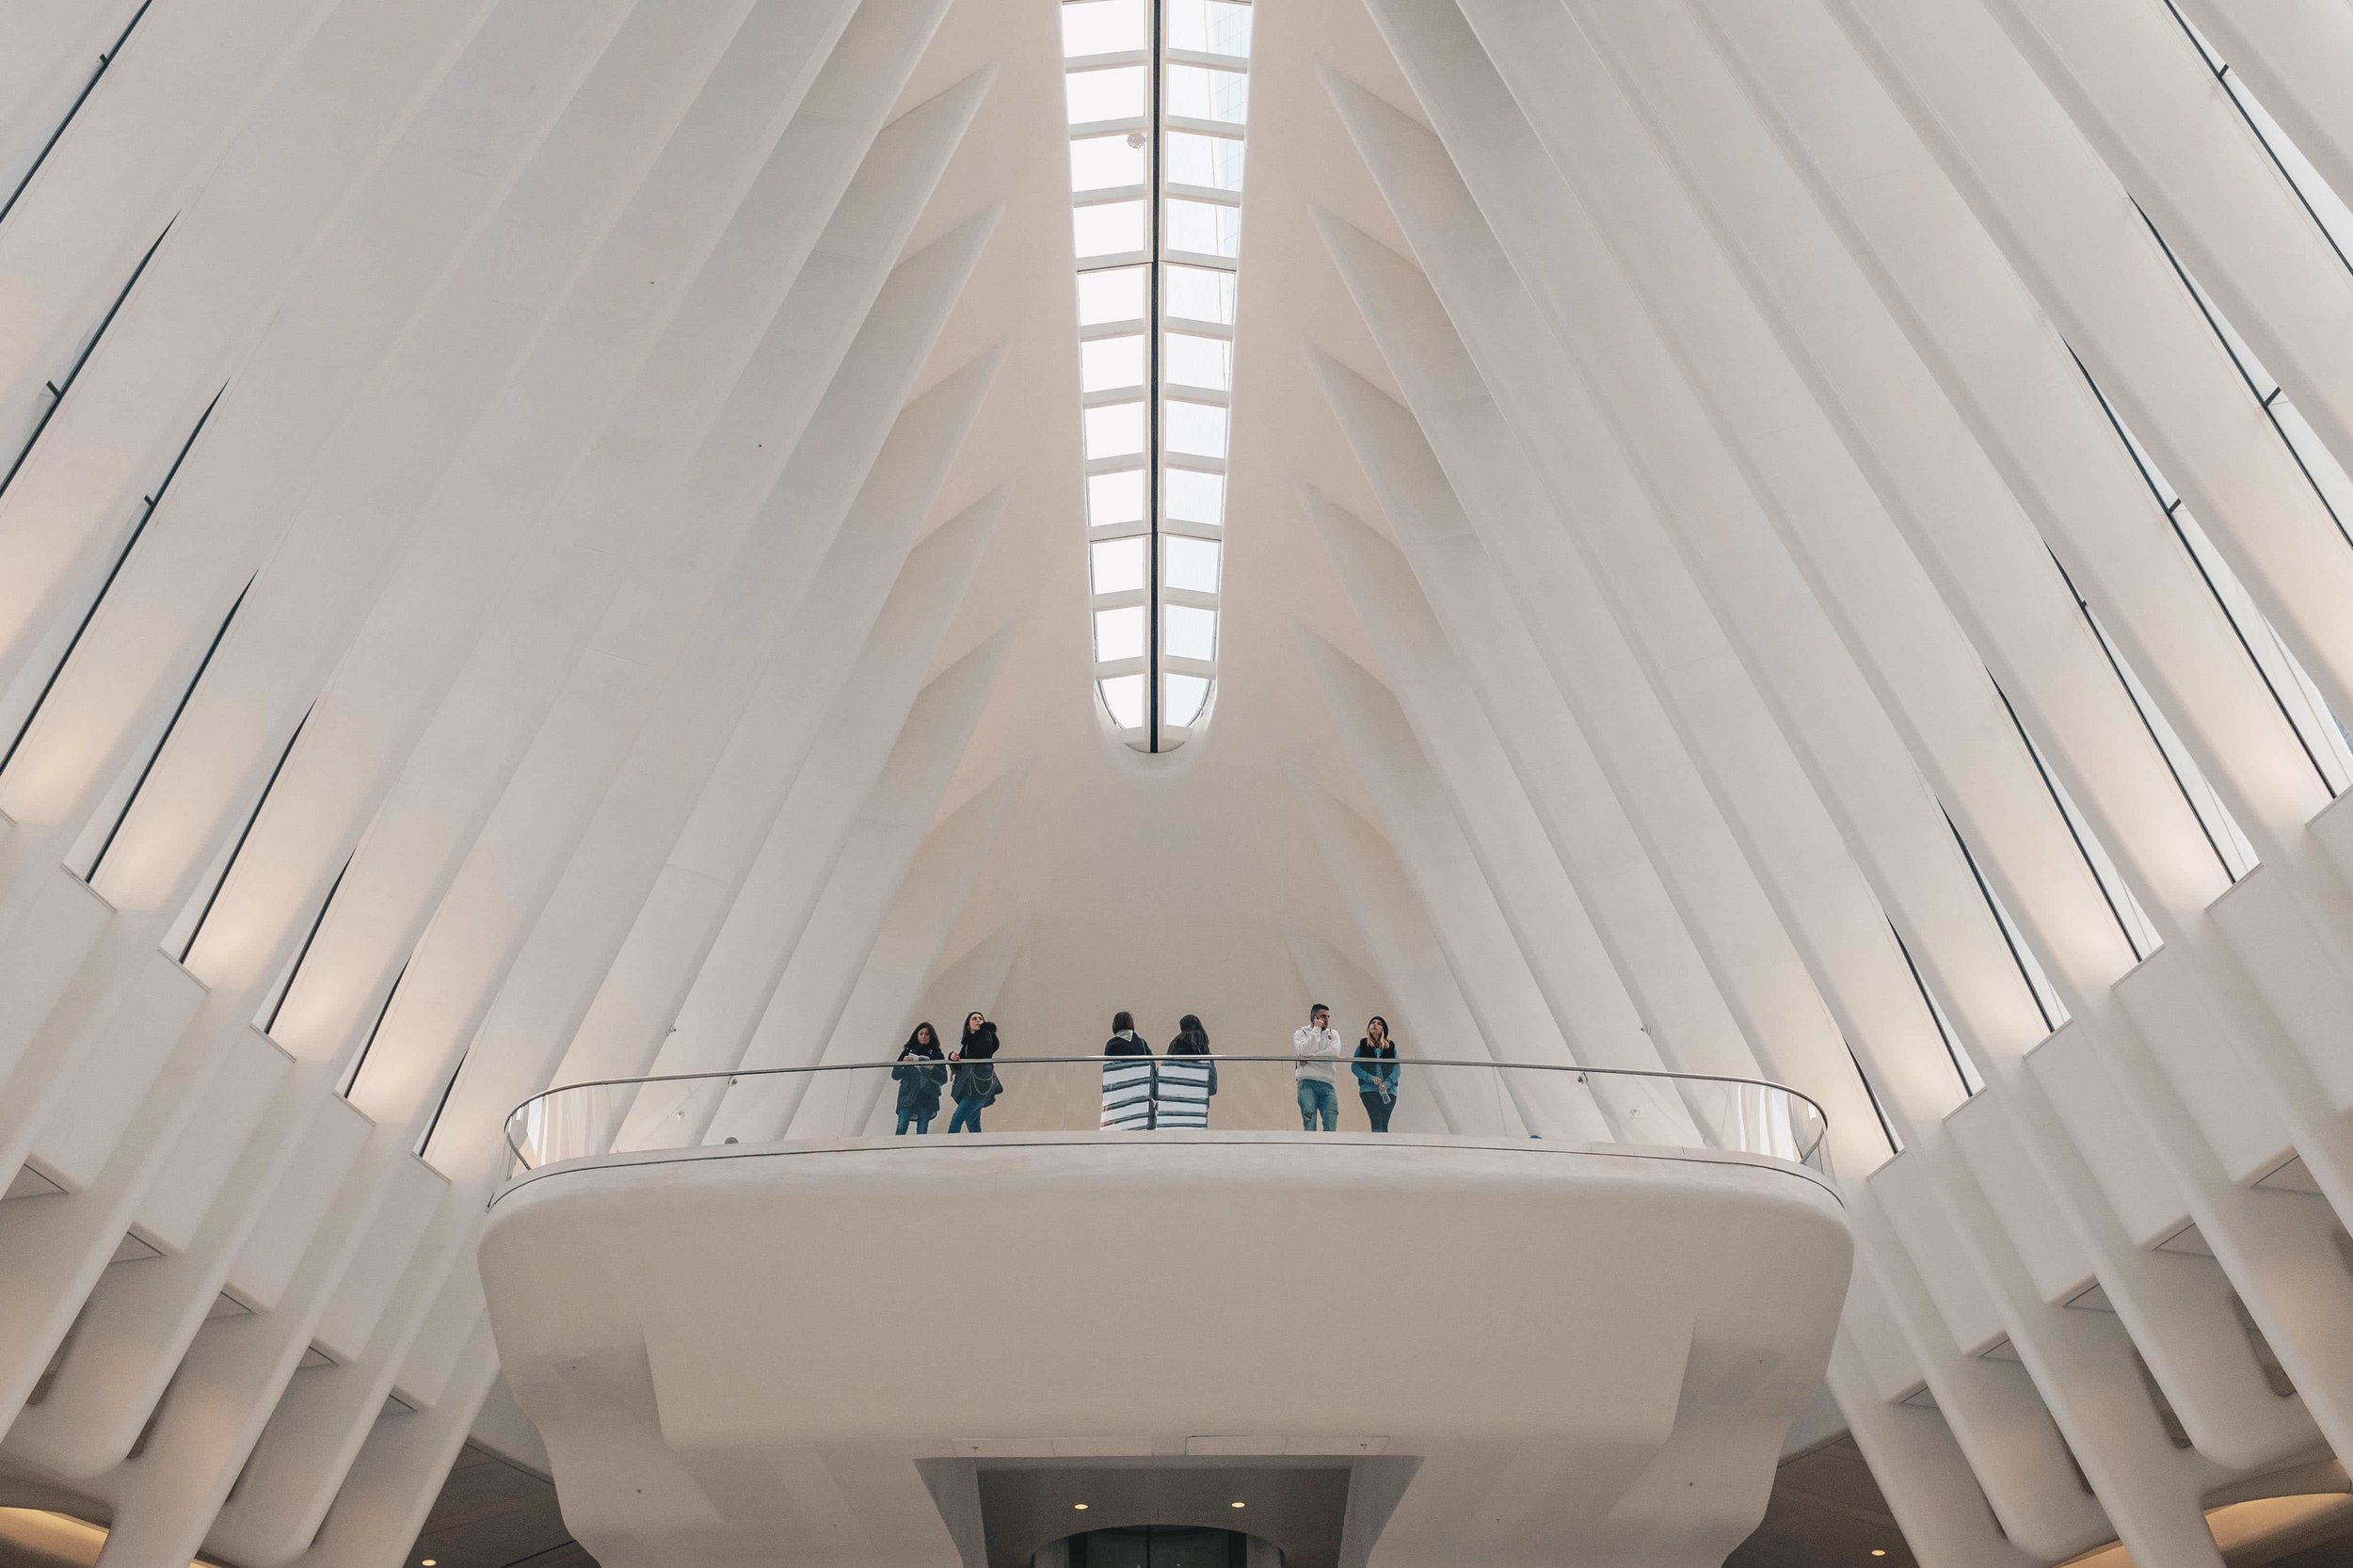 nyc-the-oculus-mall.jpg